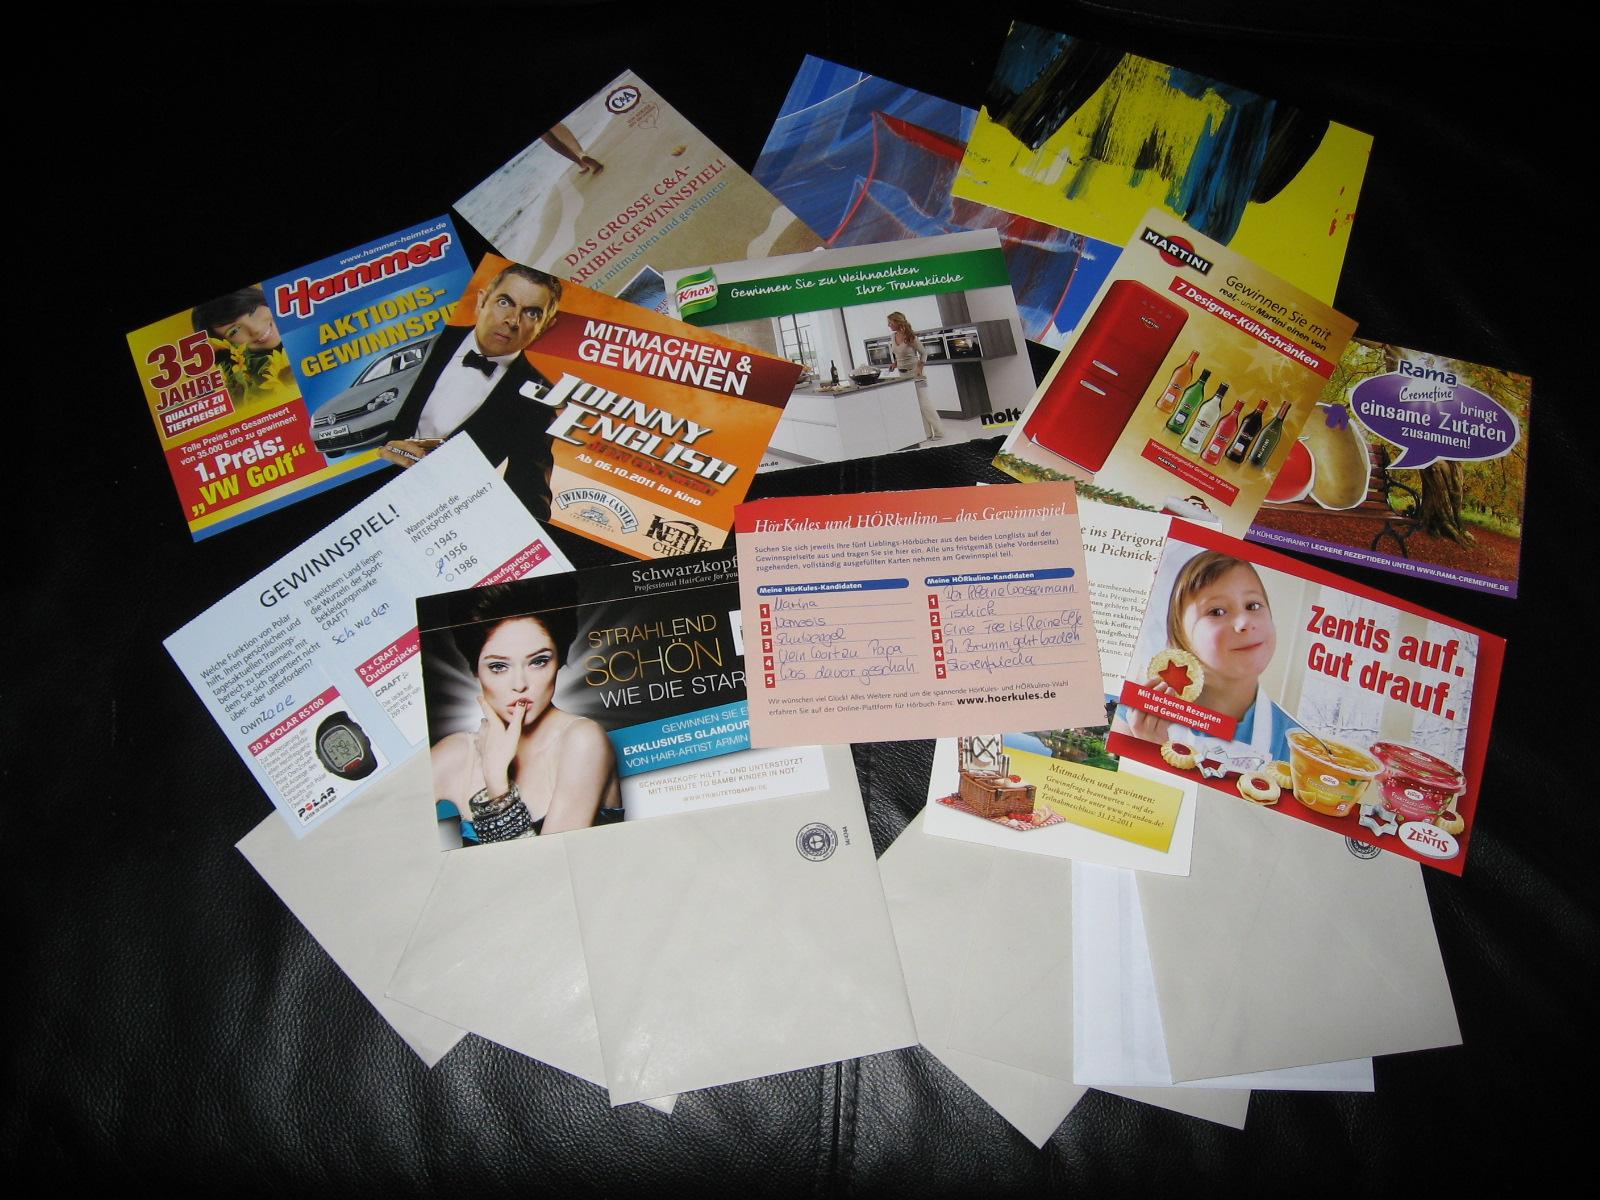 http://2.bp.blogspot.com/-fgcN9W33xU0/TvuHvPWzabI/AAAAAAAAAQ8/pP7WmN5tfLk/s1600/IMG_7934.JPG